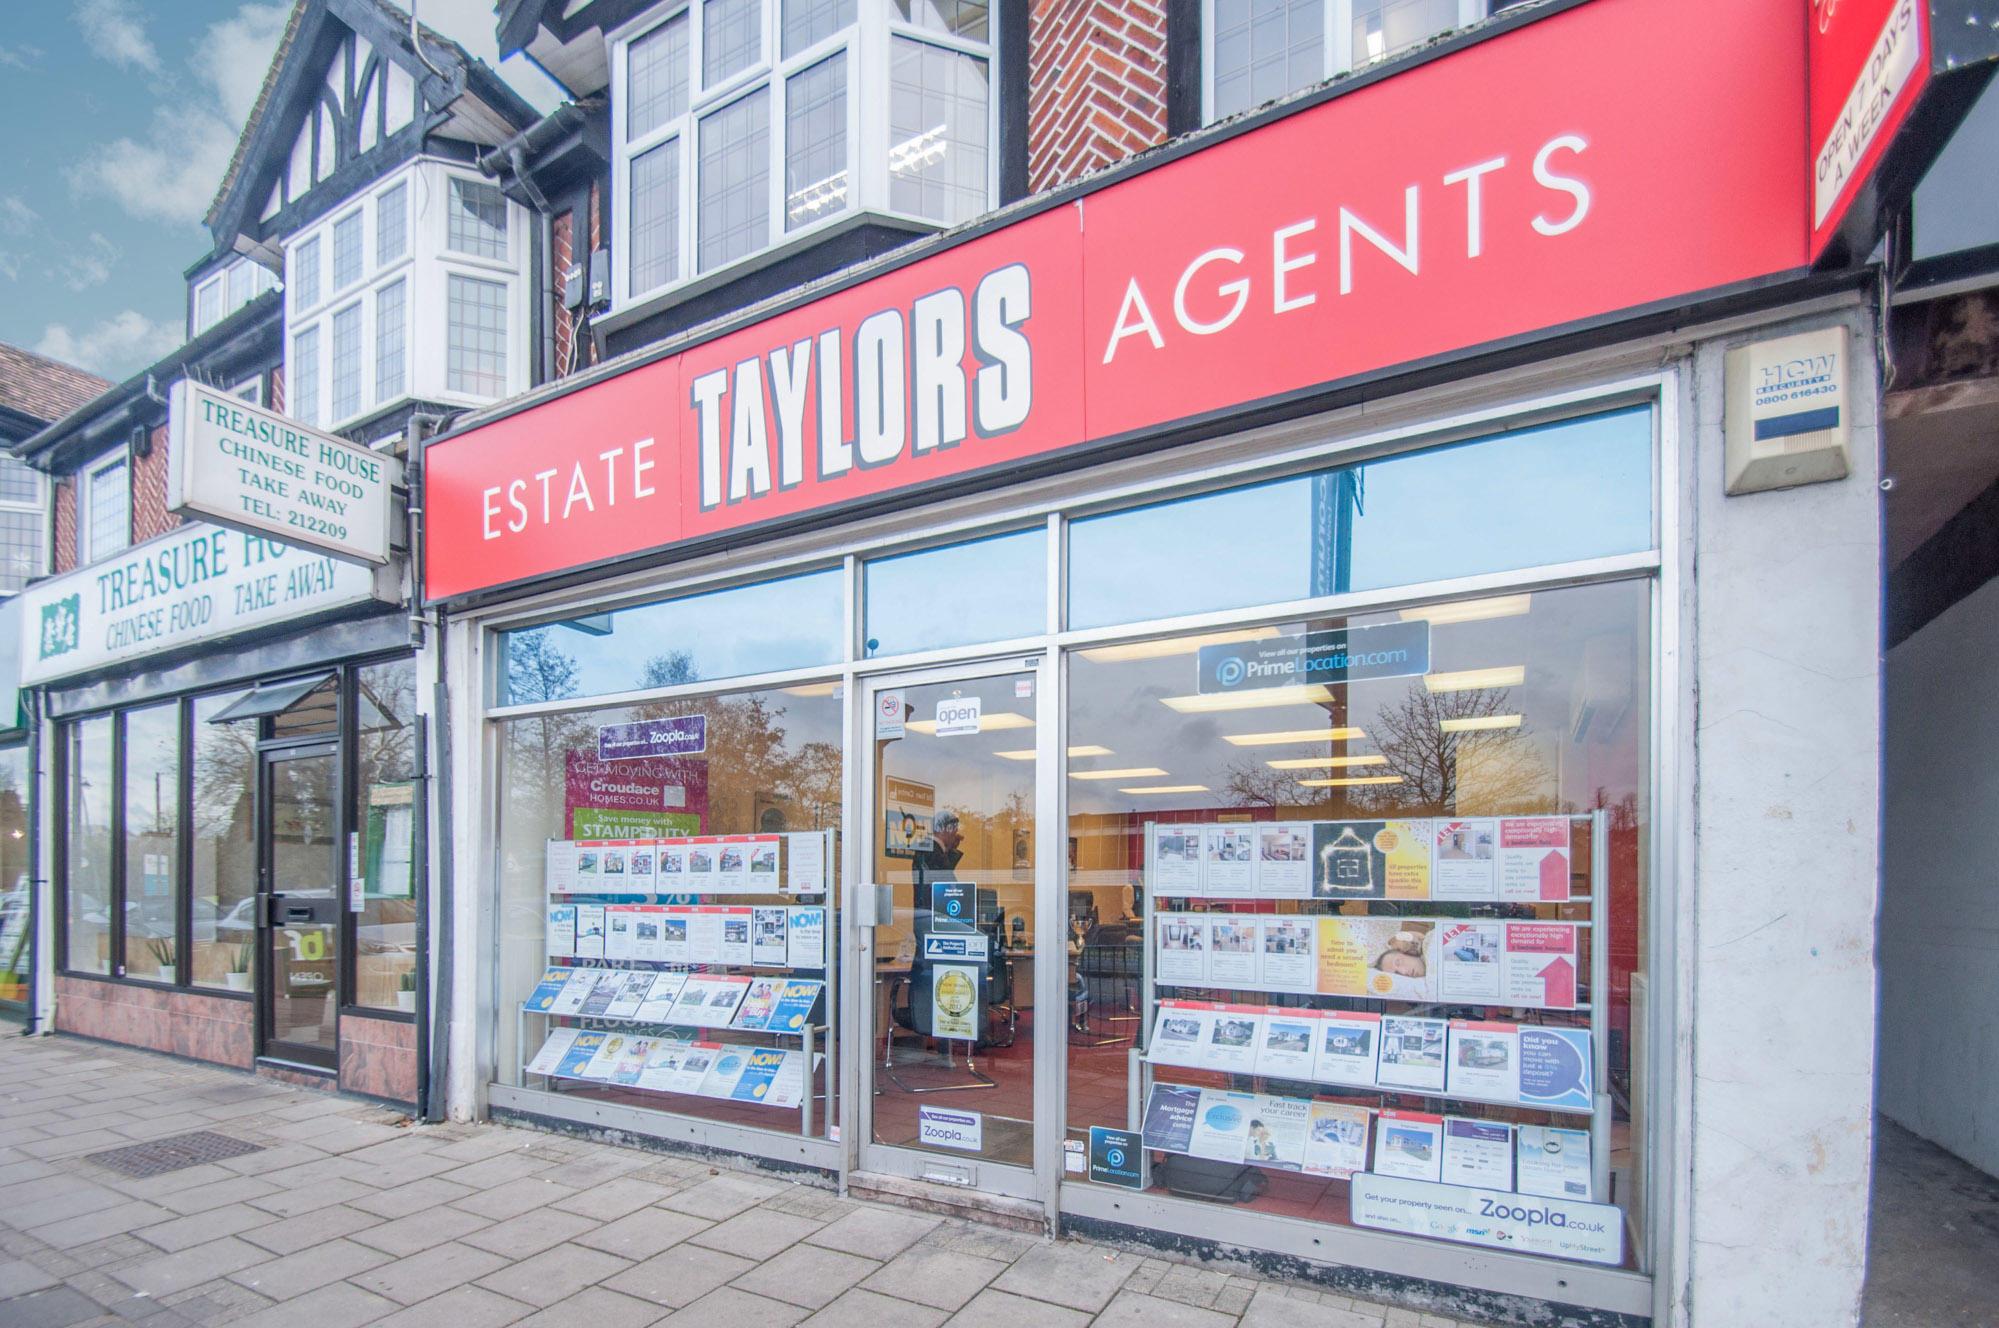 Taylors Estate and Letting Agents Hemel Hempstead